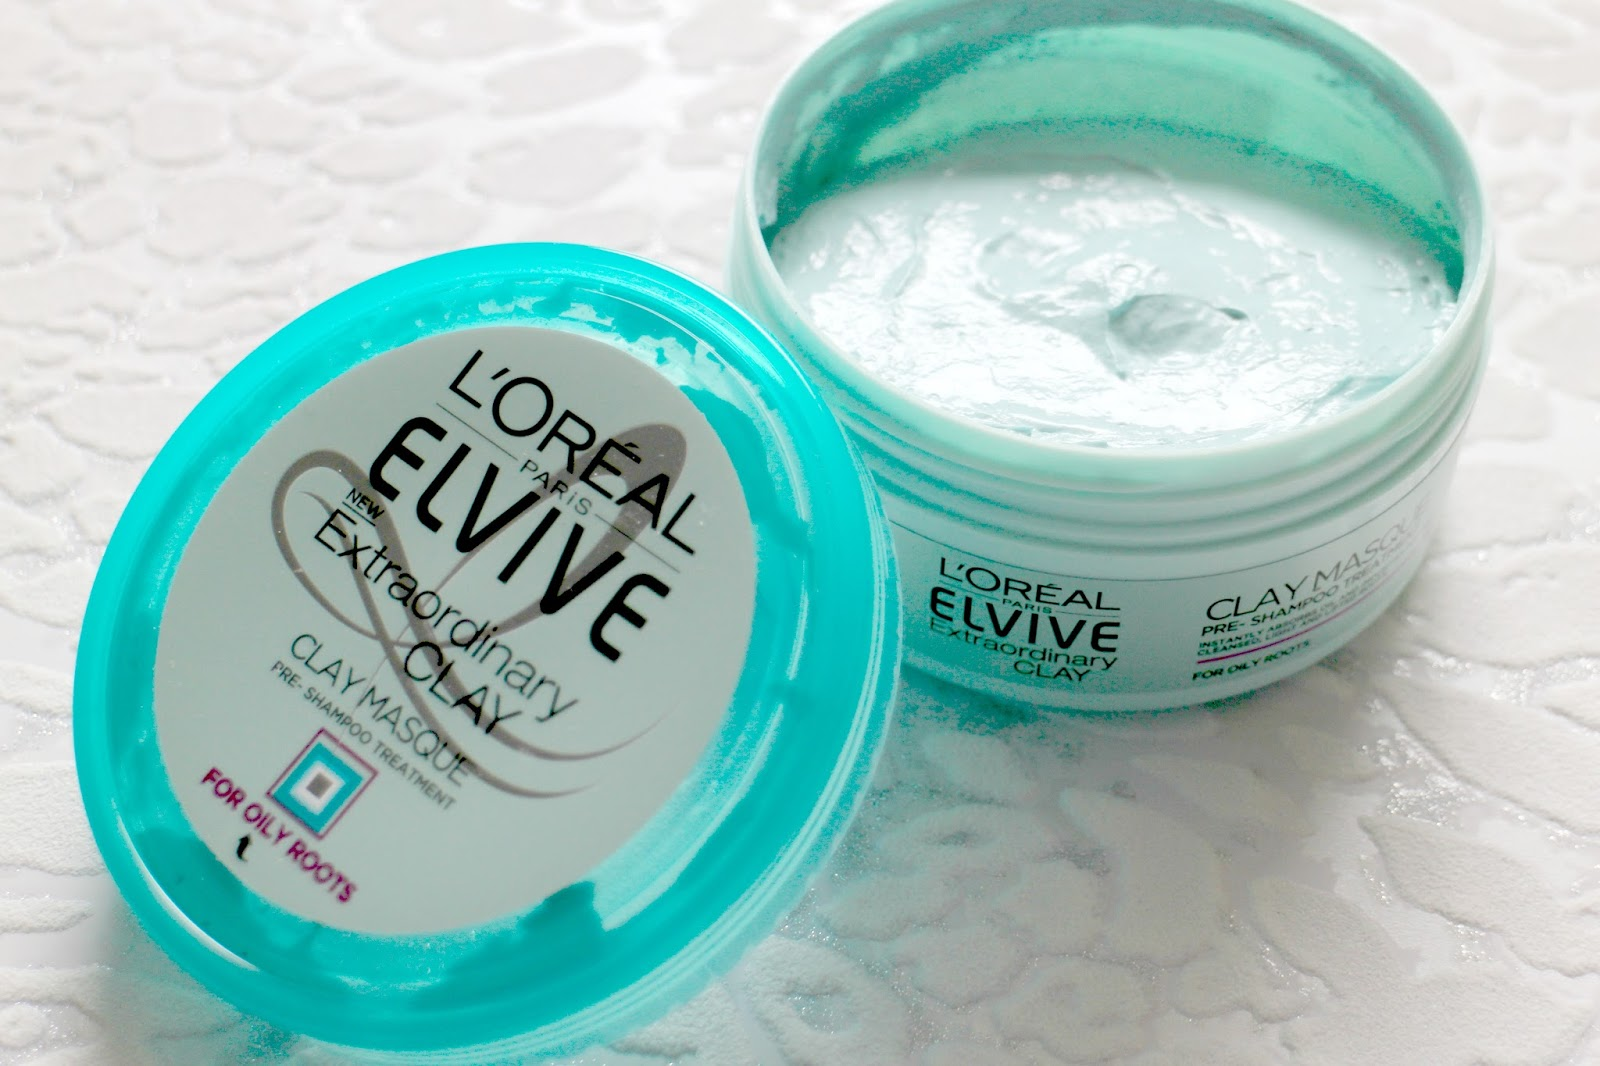 L'Oreal Elvive Extraordinary Clay Masque